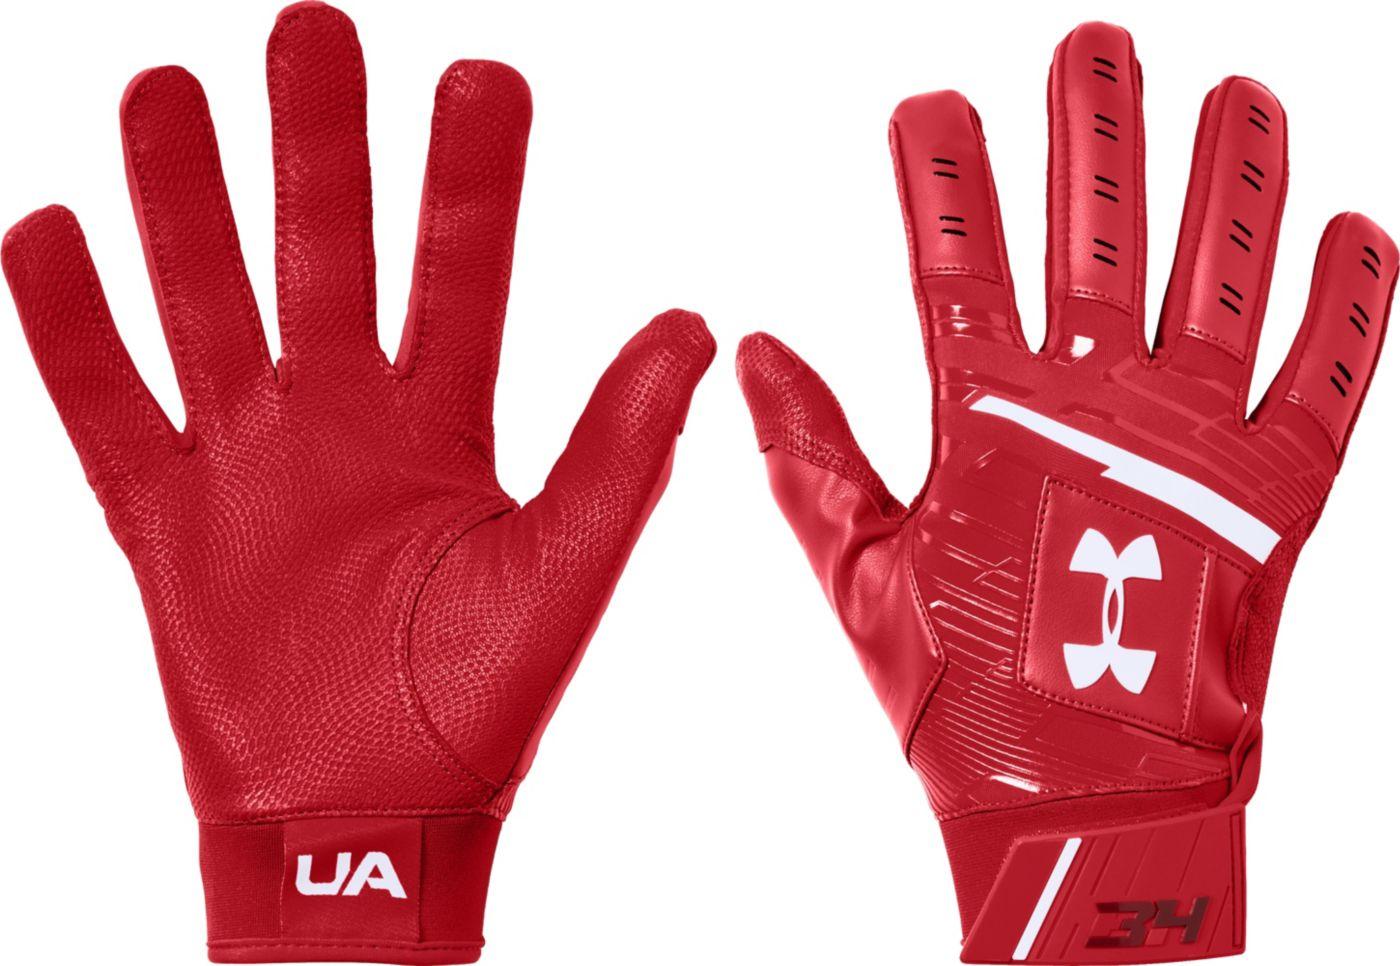 Under Armour Youth Harper Hustle Batting Gloves